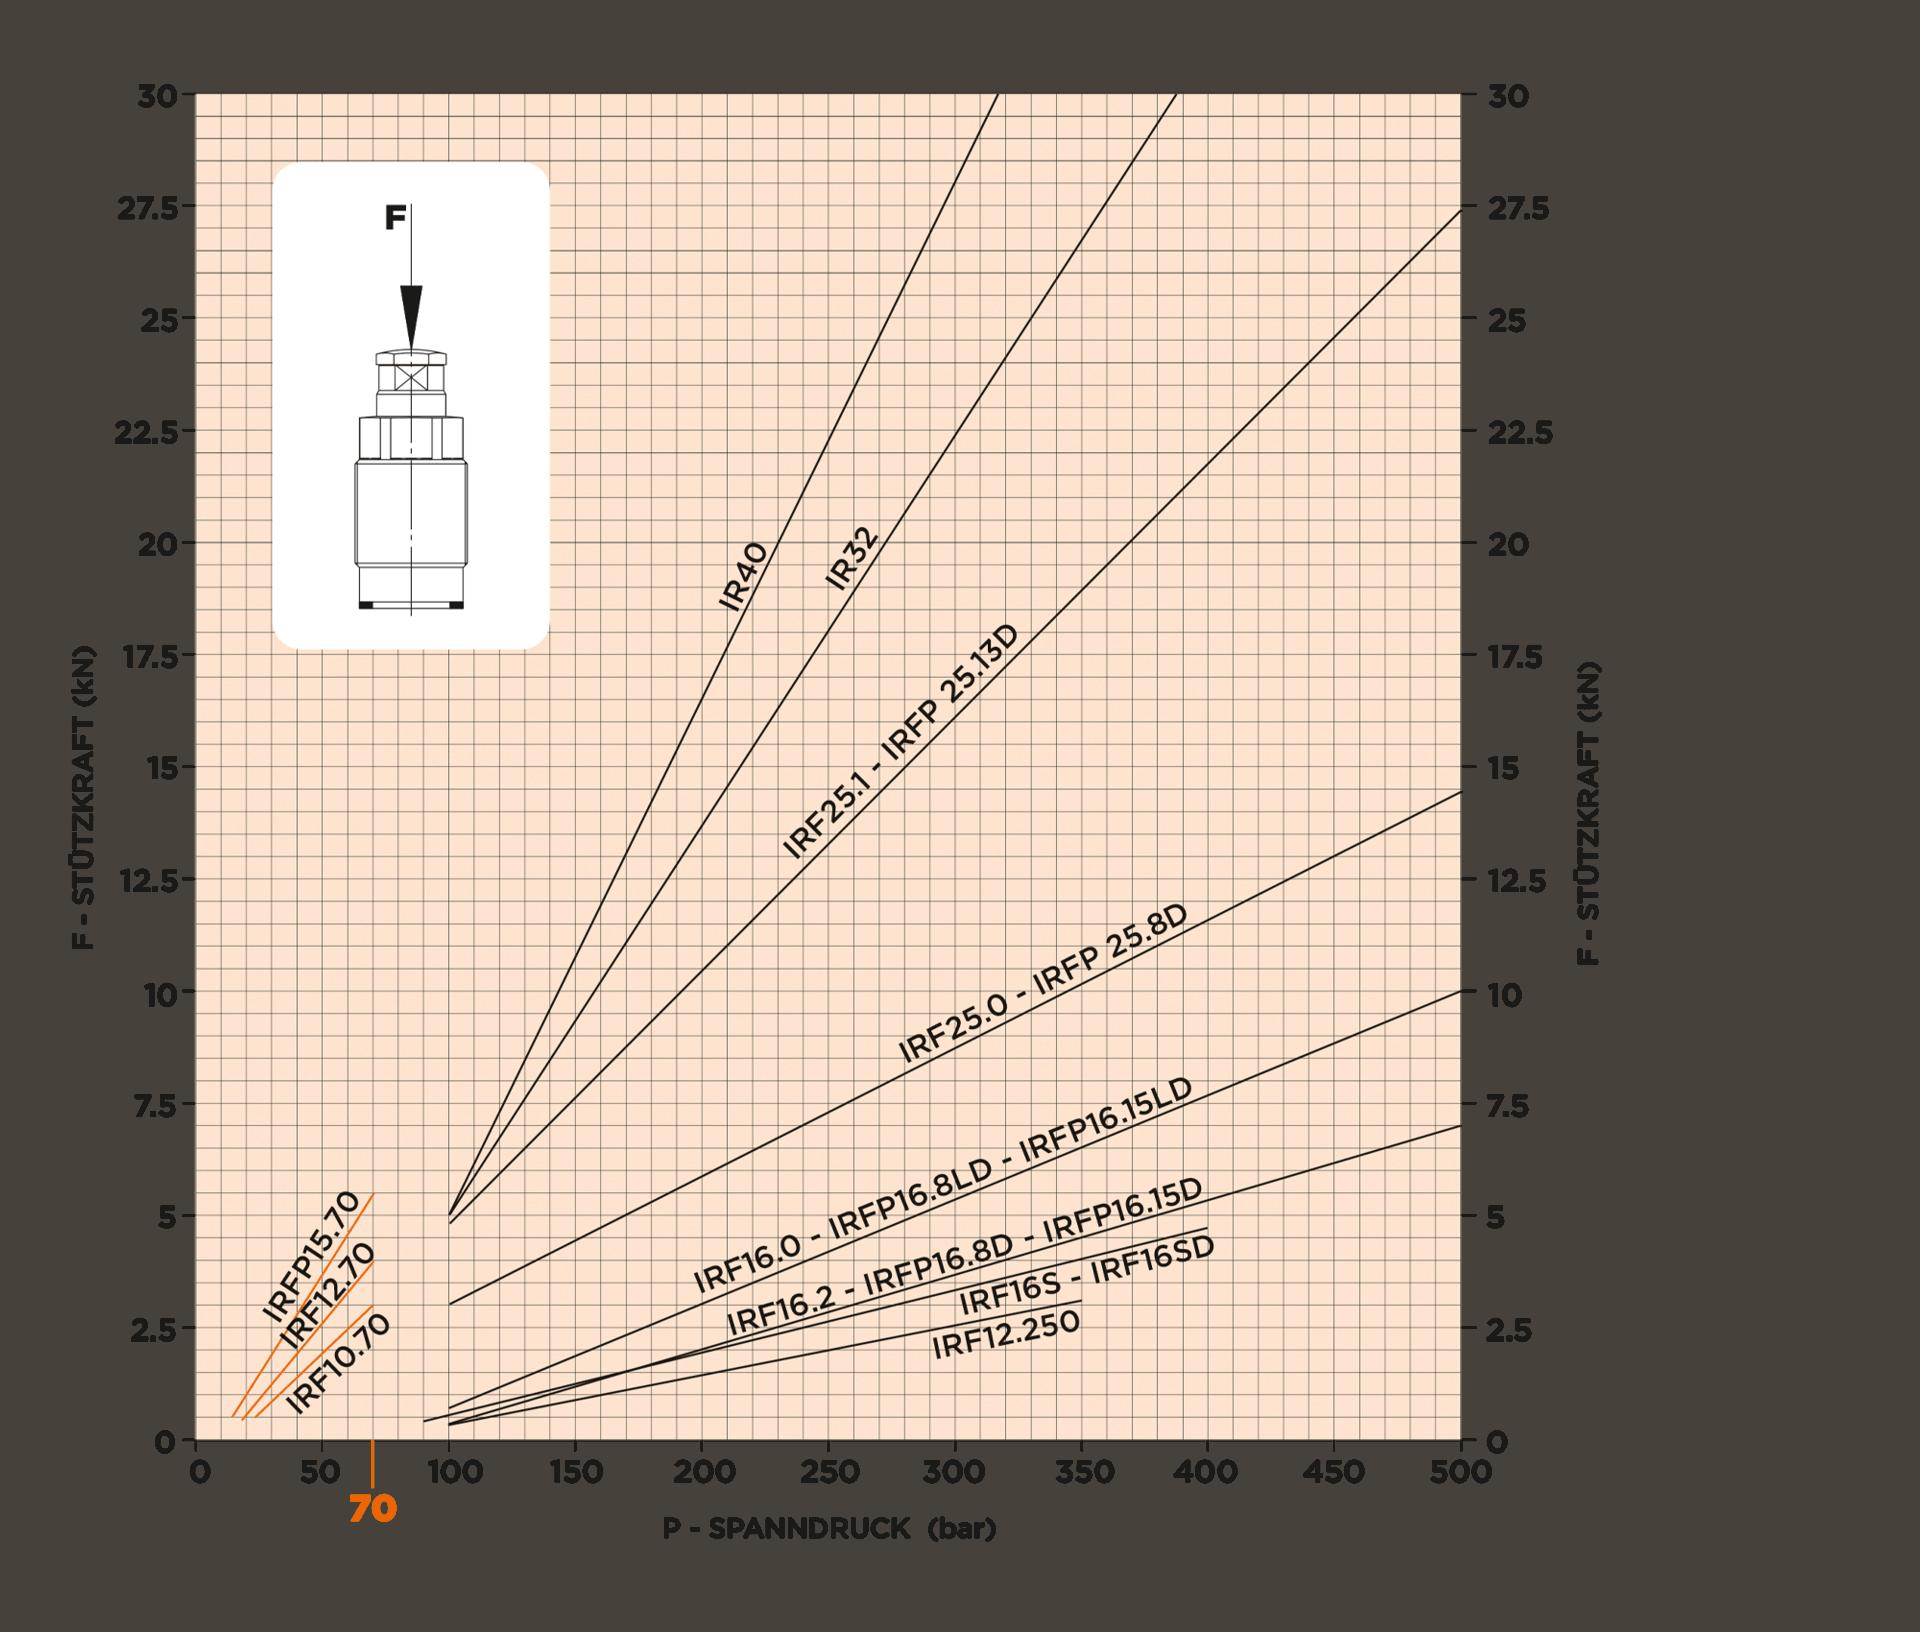 1.3.1. Diagramm